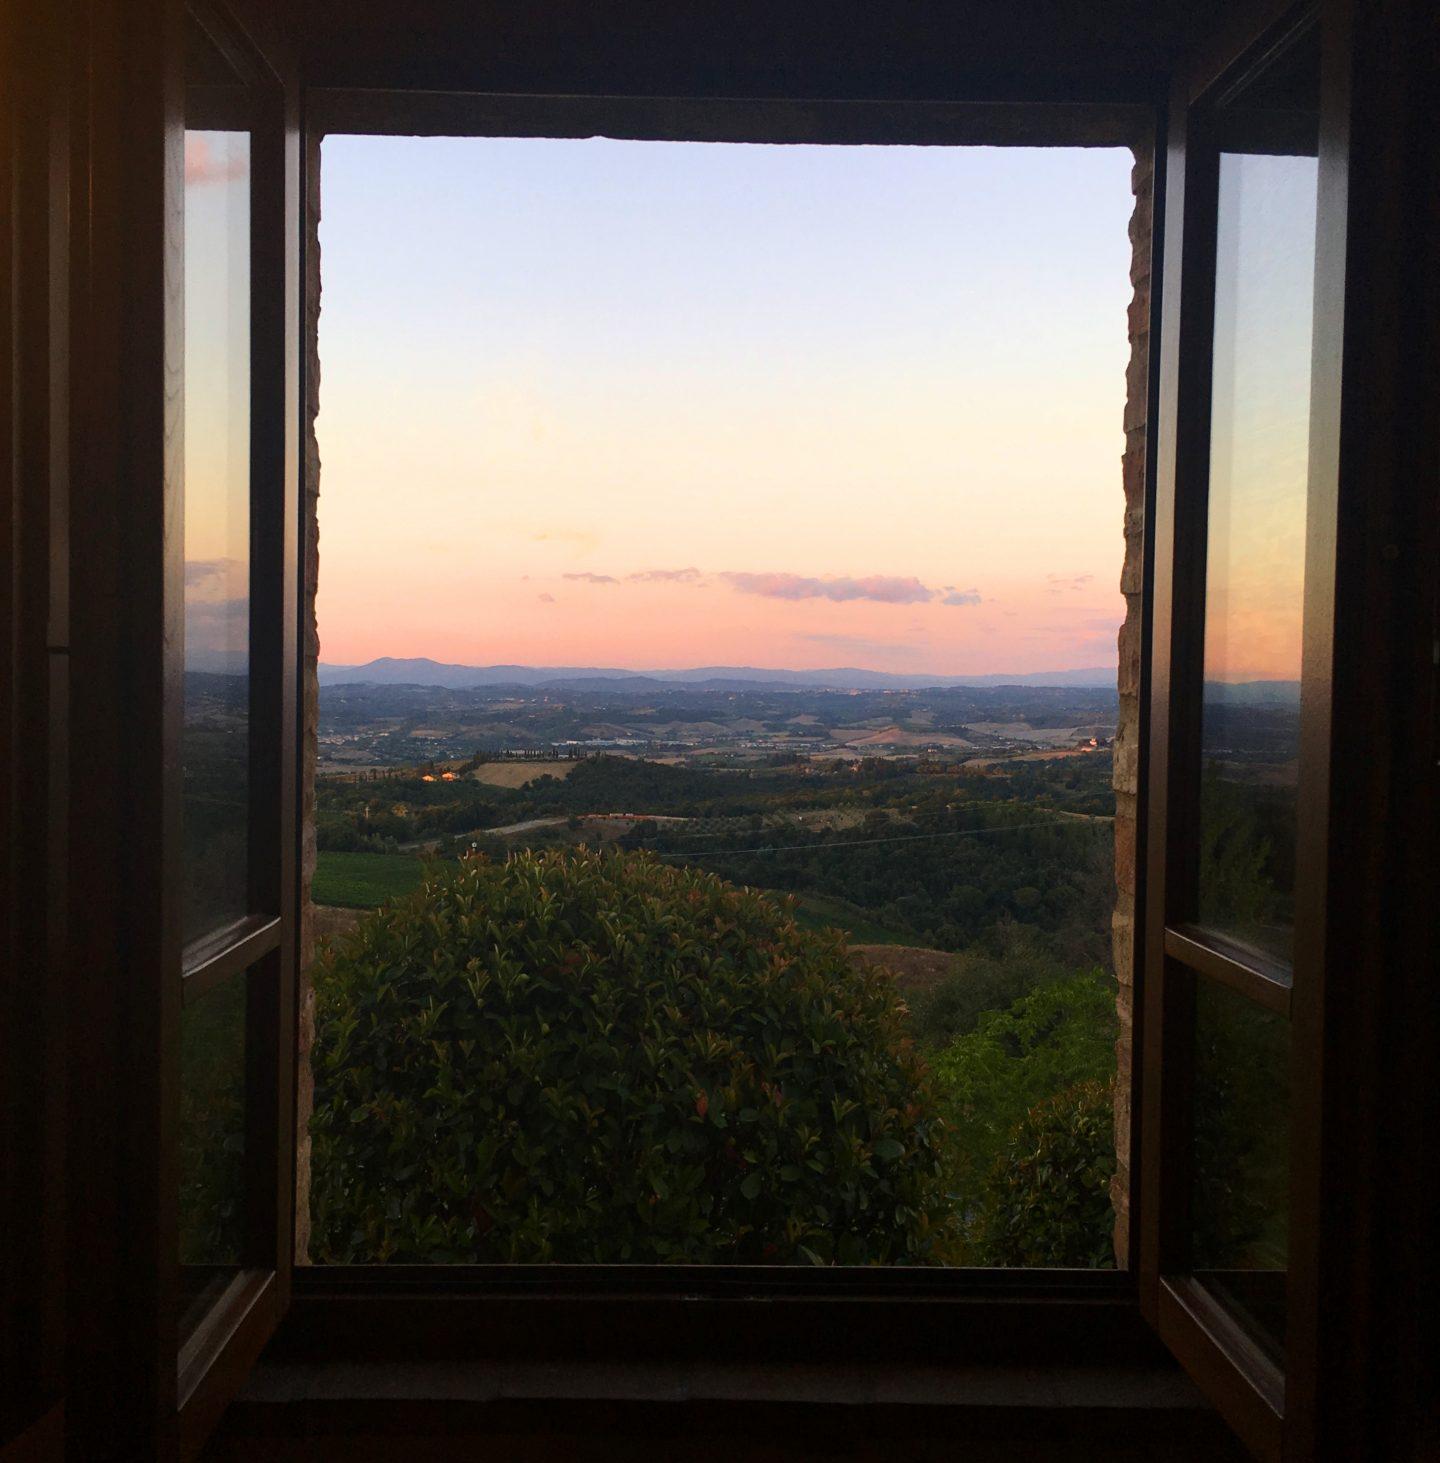 sunset-window